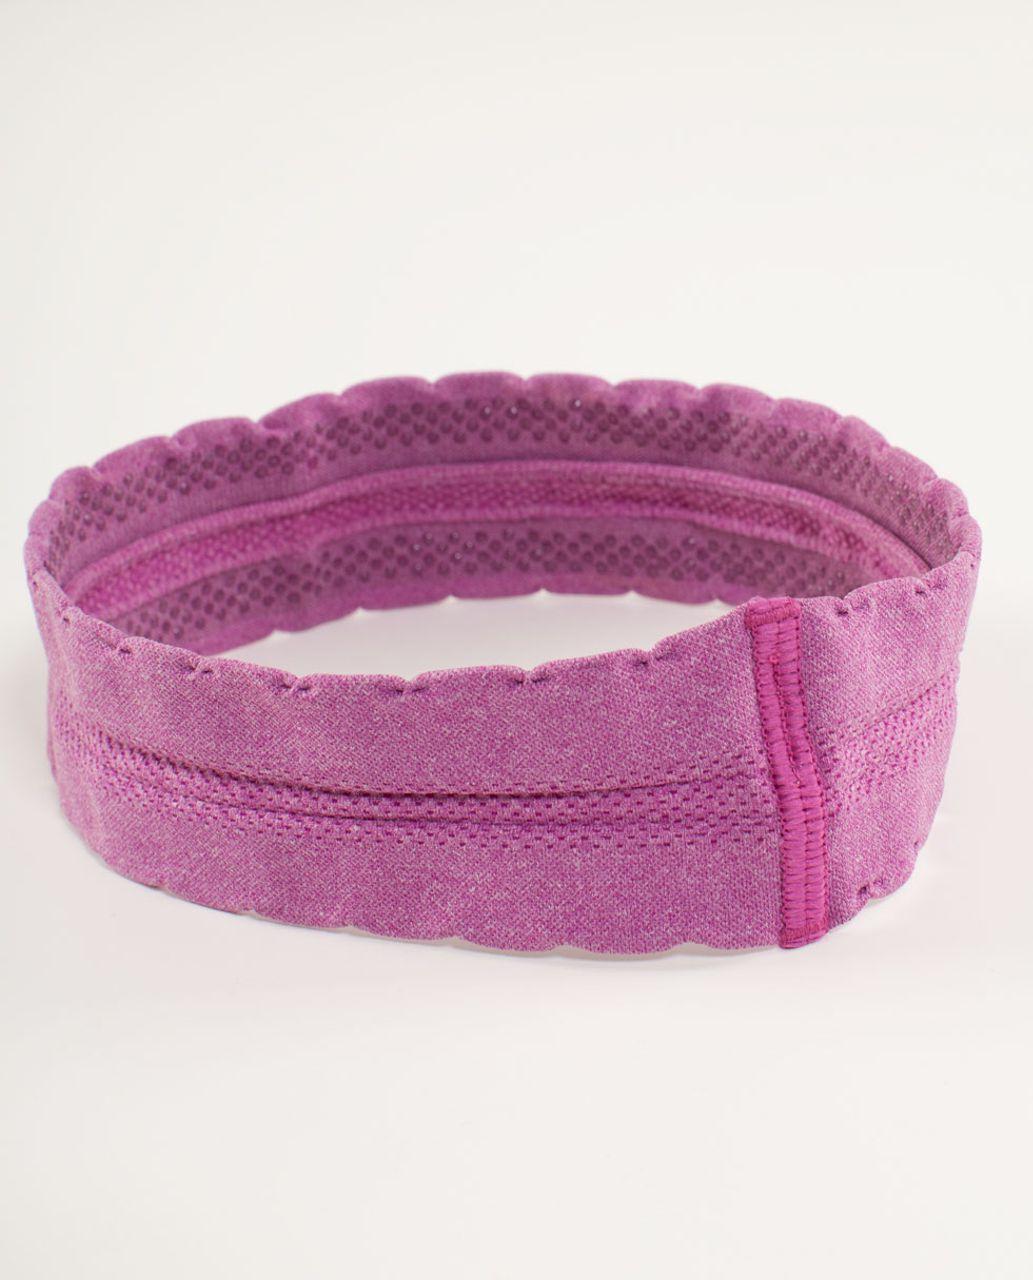 Lululemon Swiftly Headband - Ultra Violet